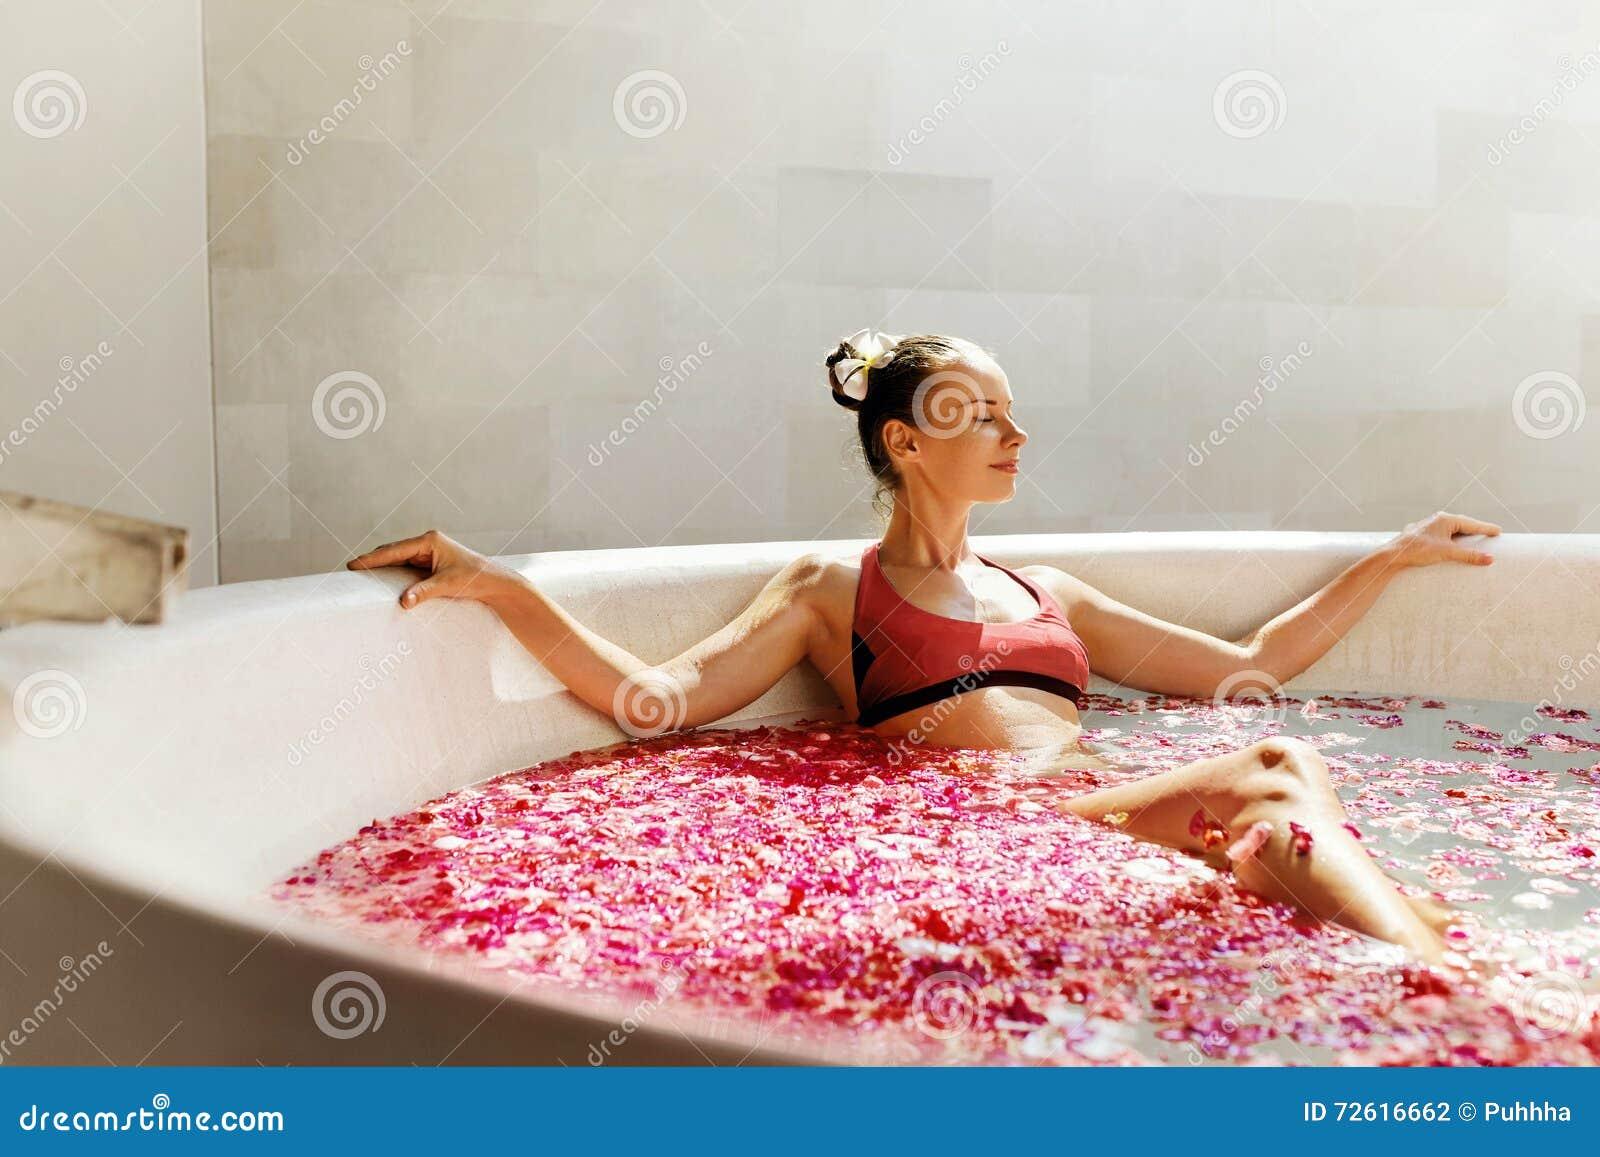 Frau Im Blumen-Bad Am Tagesbadekurort-Salon Stockfoto